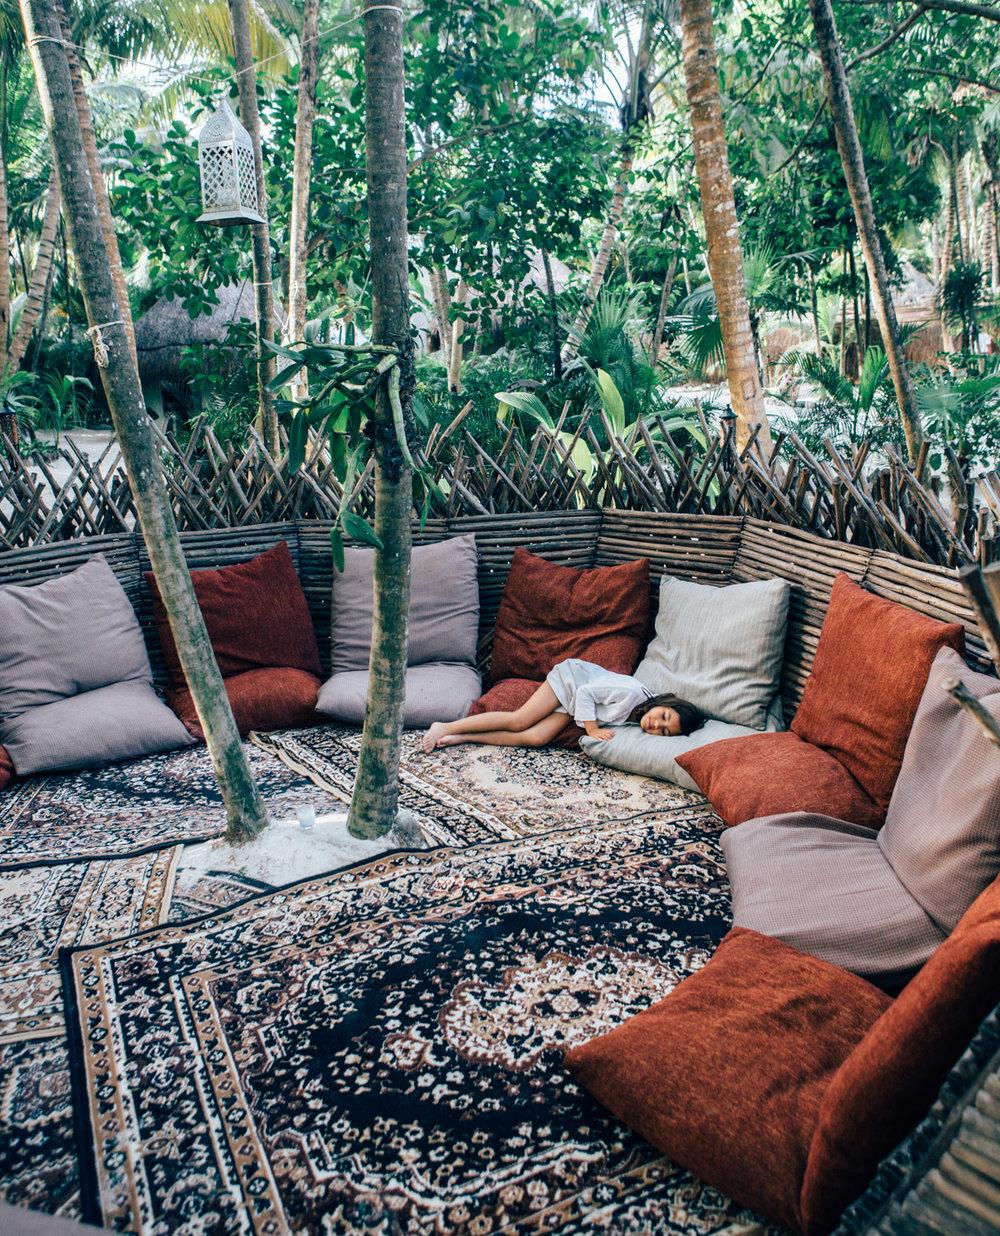 Garden, Tulum, Mexico - @lumadeline